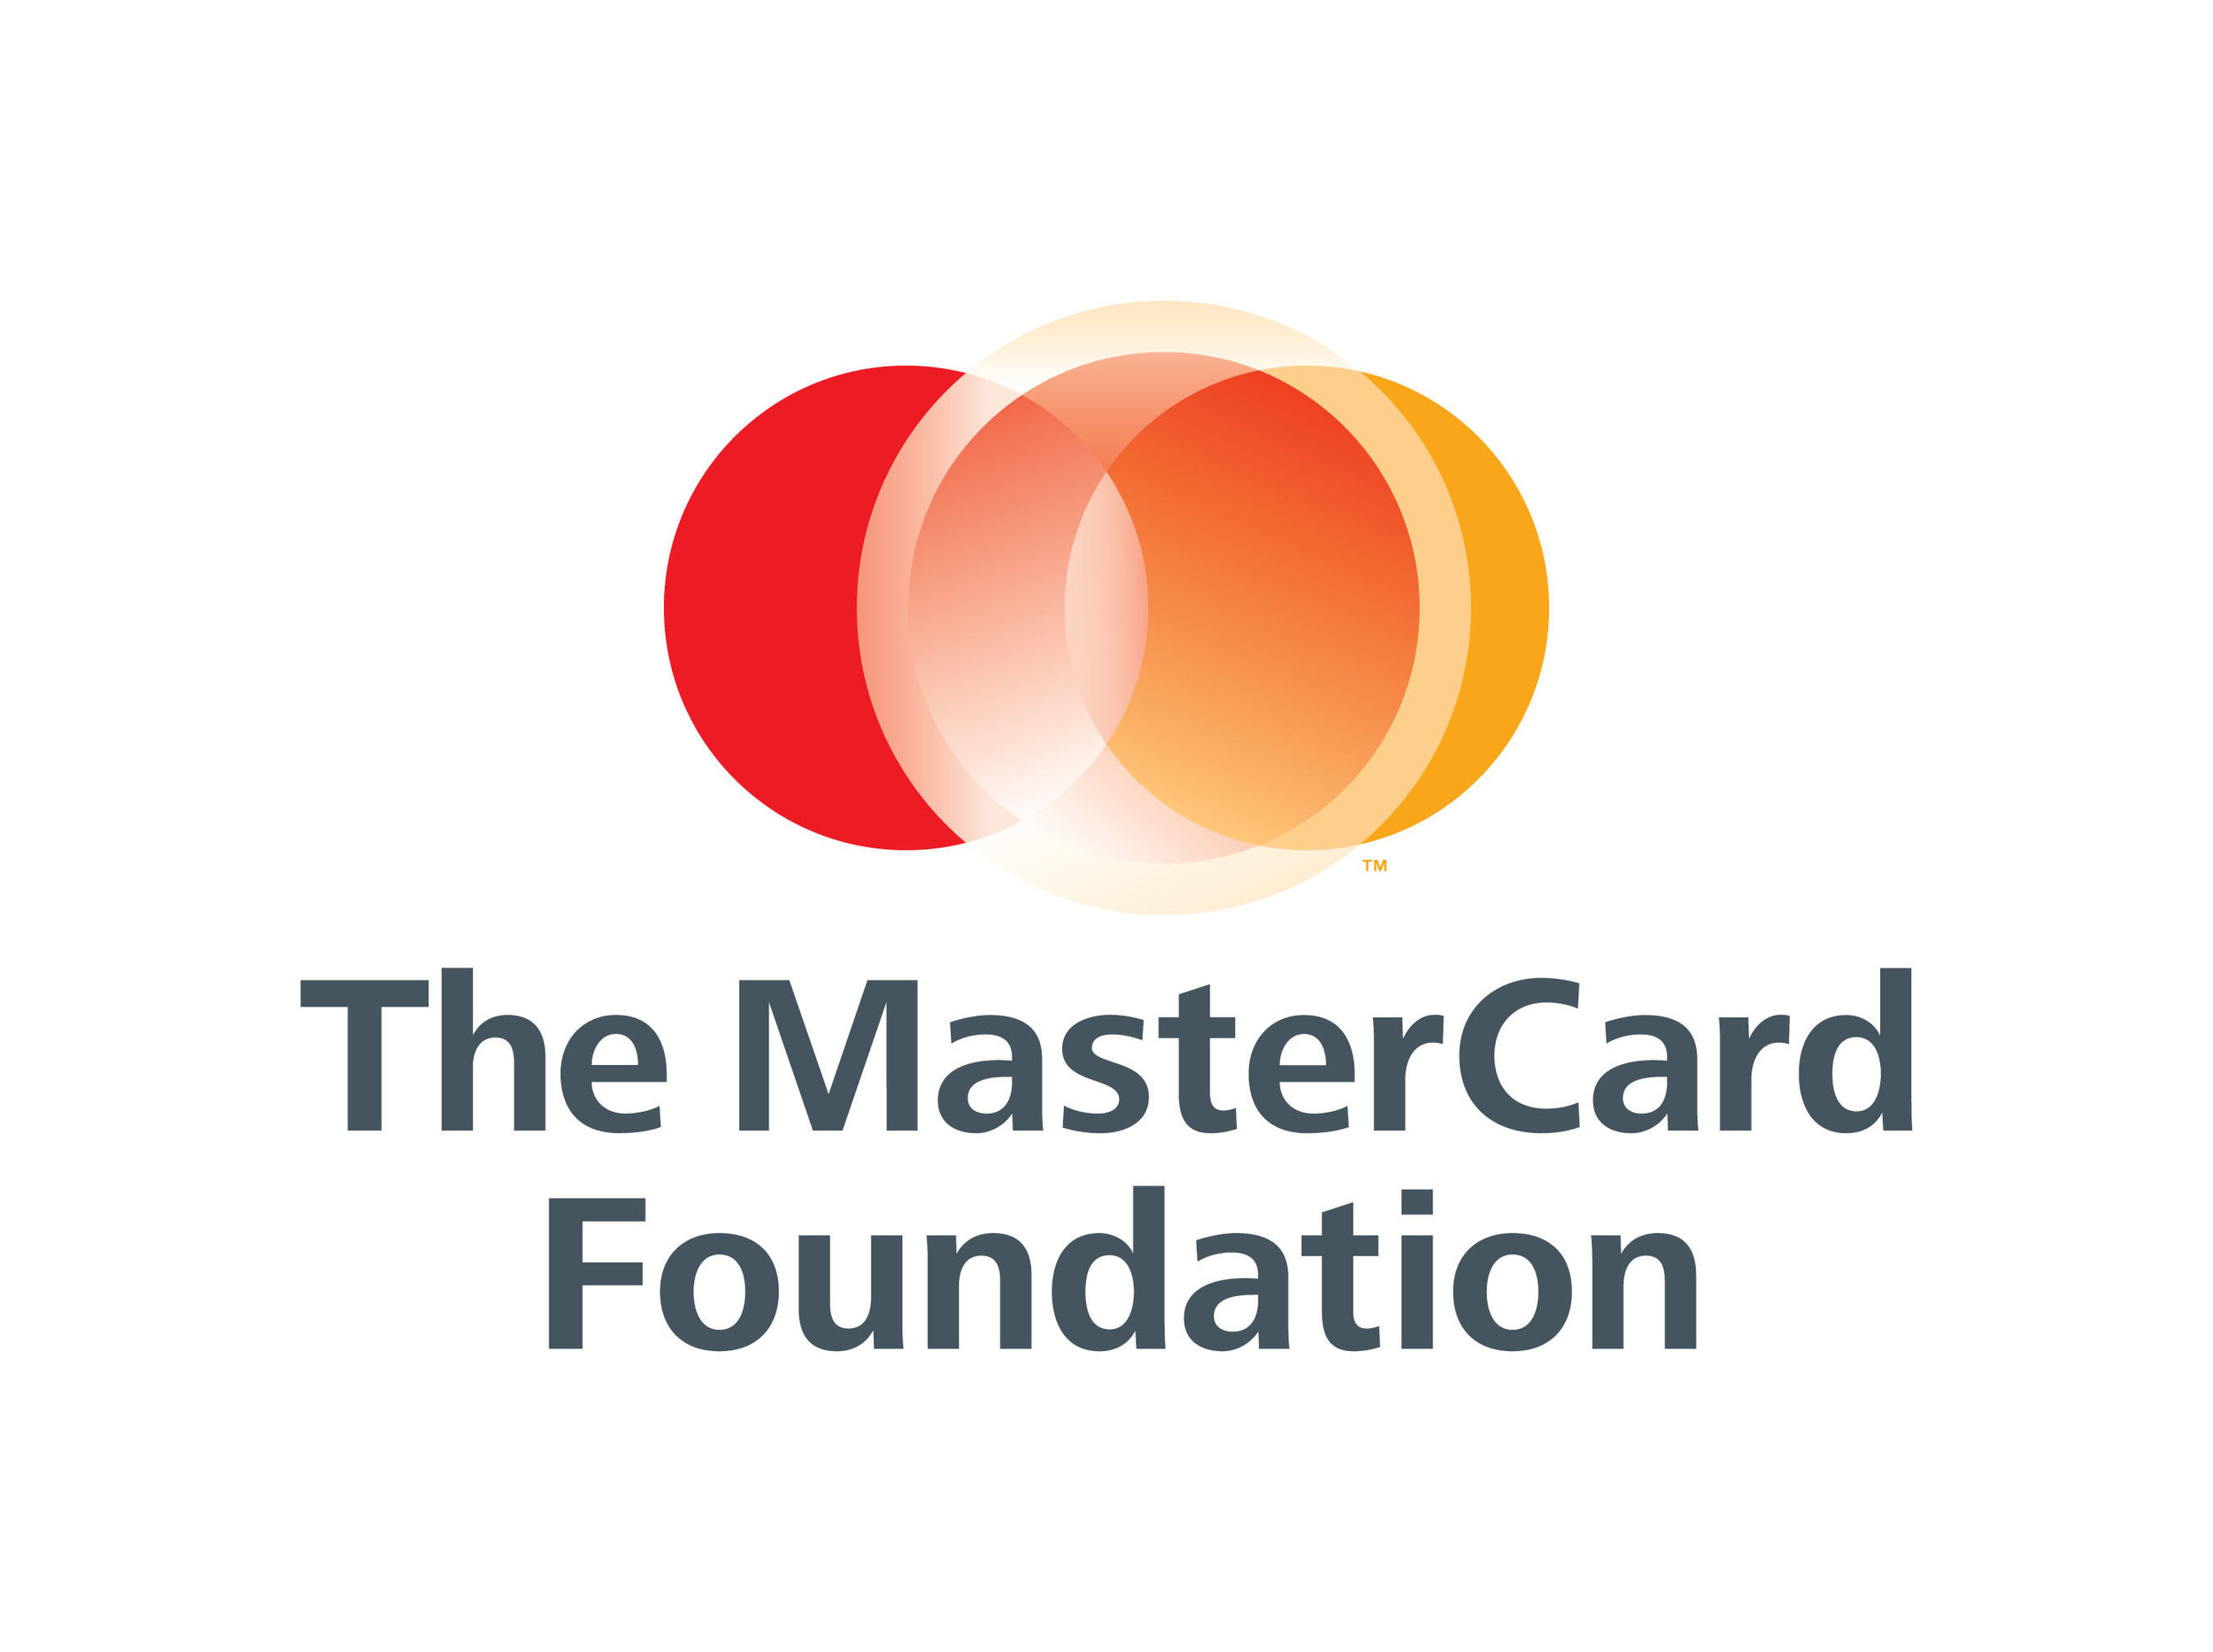 Mastercard-foundation.jpg